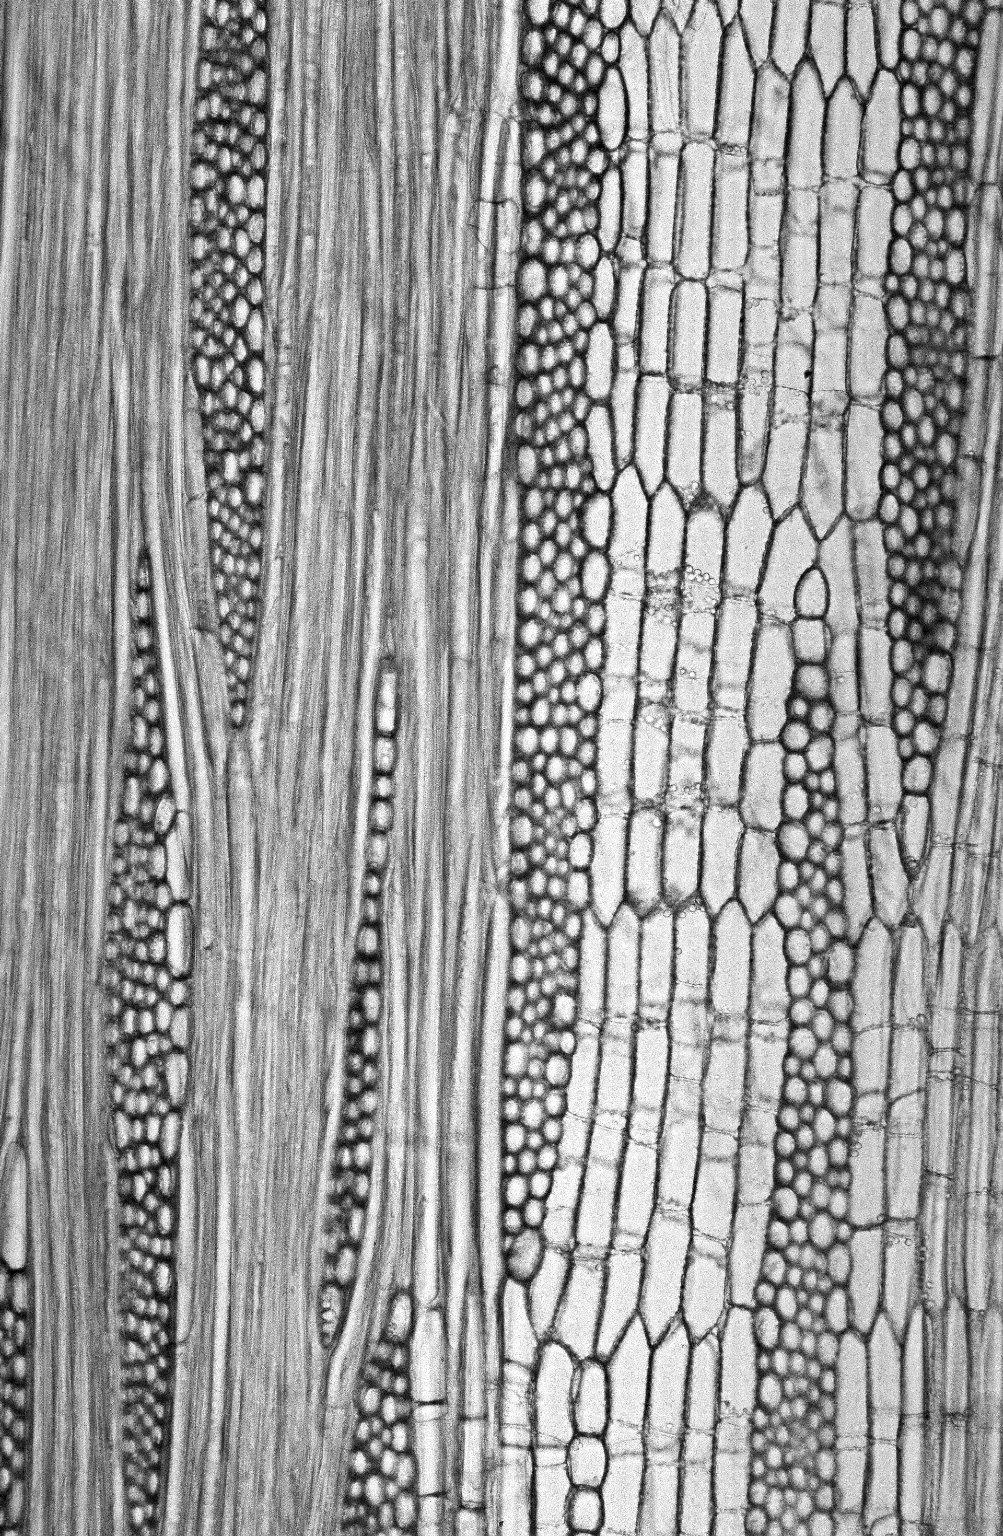 MALVACEAE STERCULIOIDEAE Pterygota macrocarpa